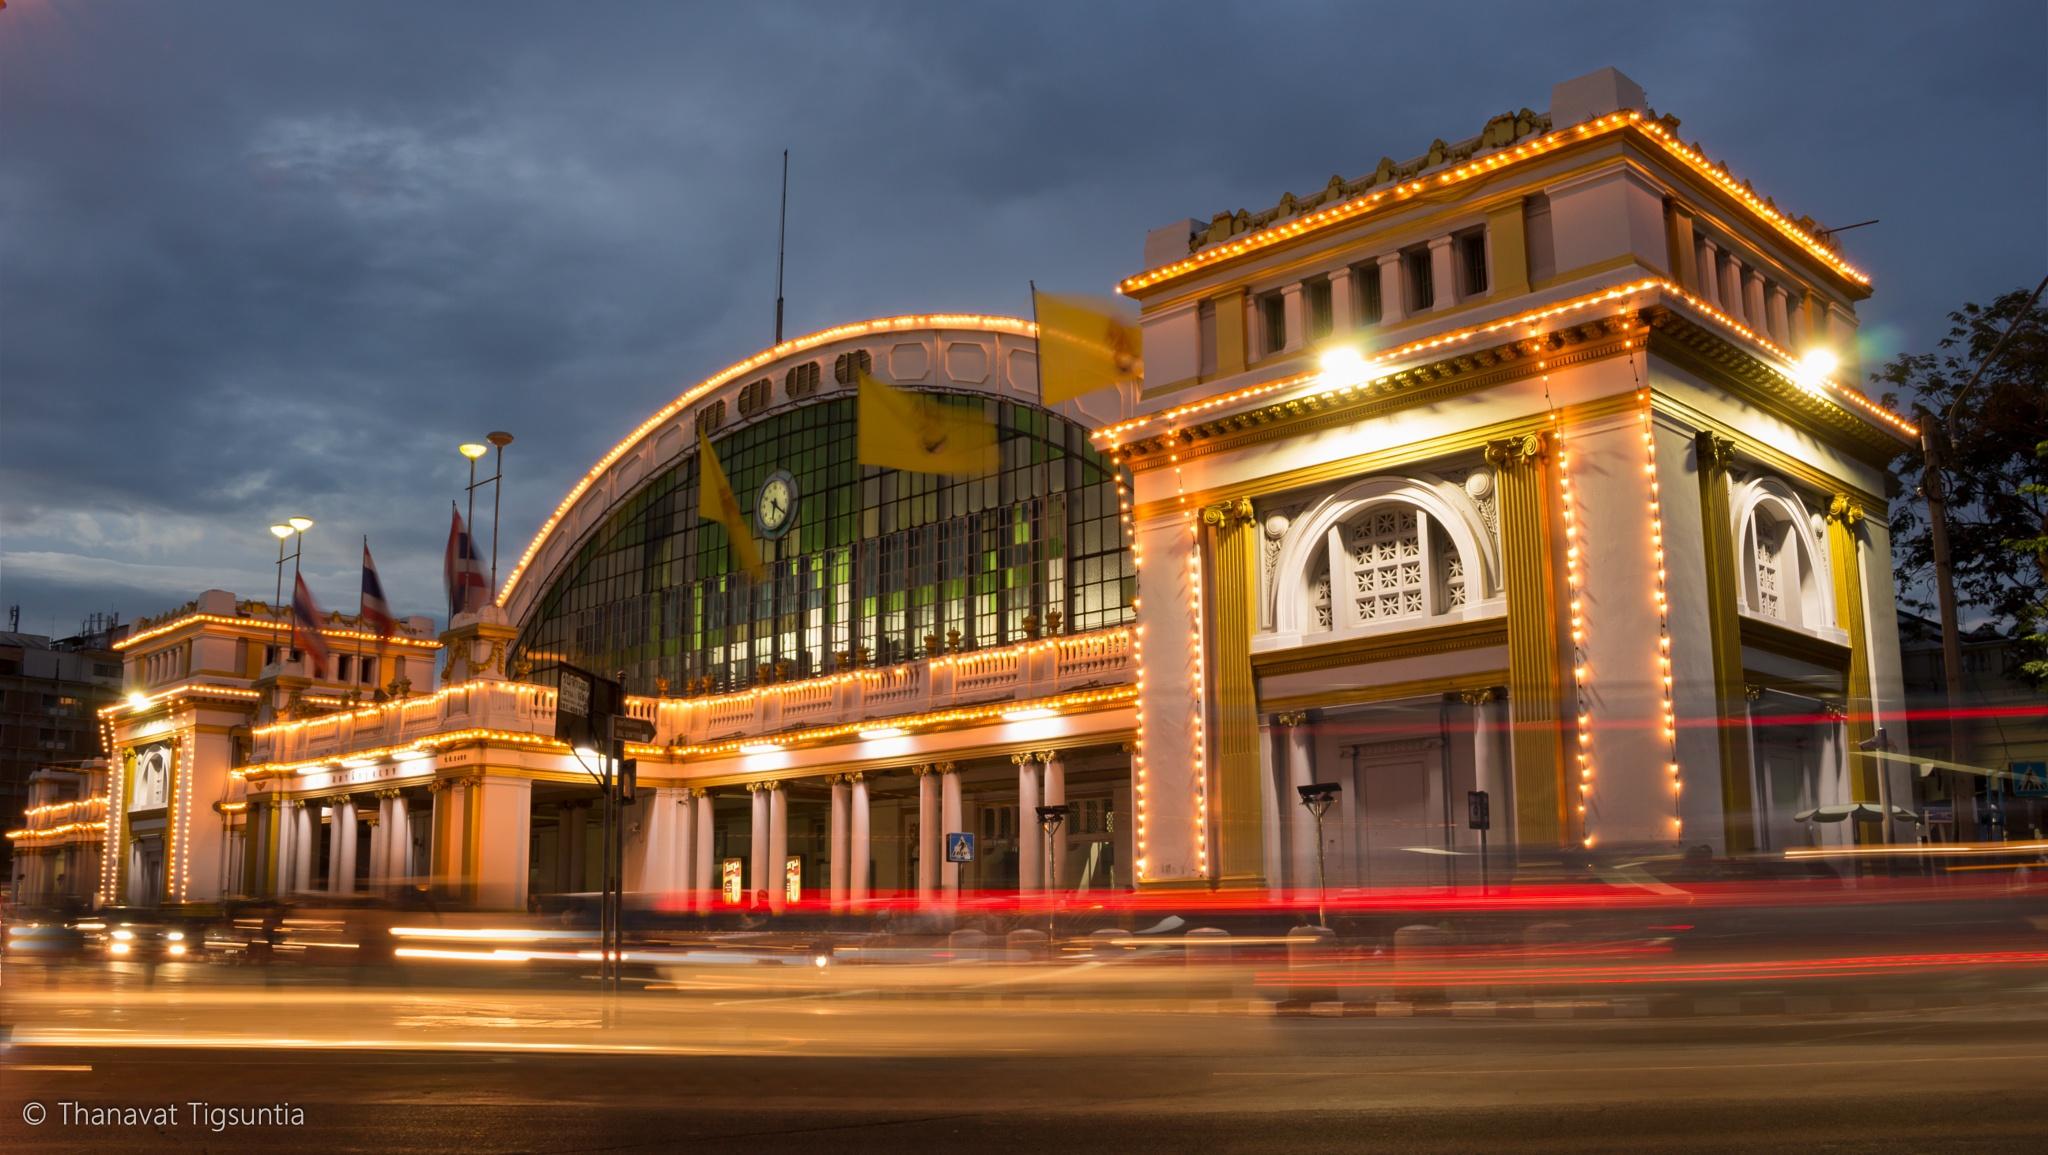 Hua Lum Pong : train station by thanavat tigsuntia